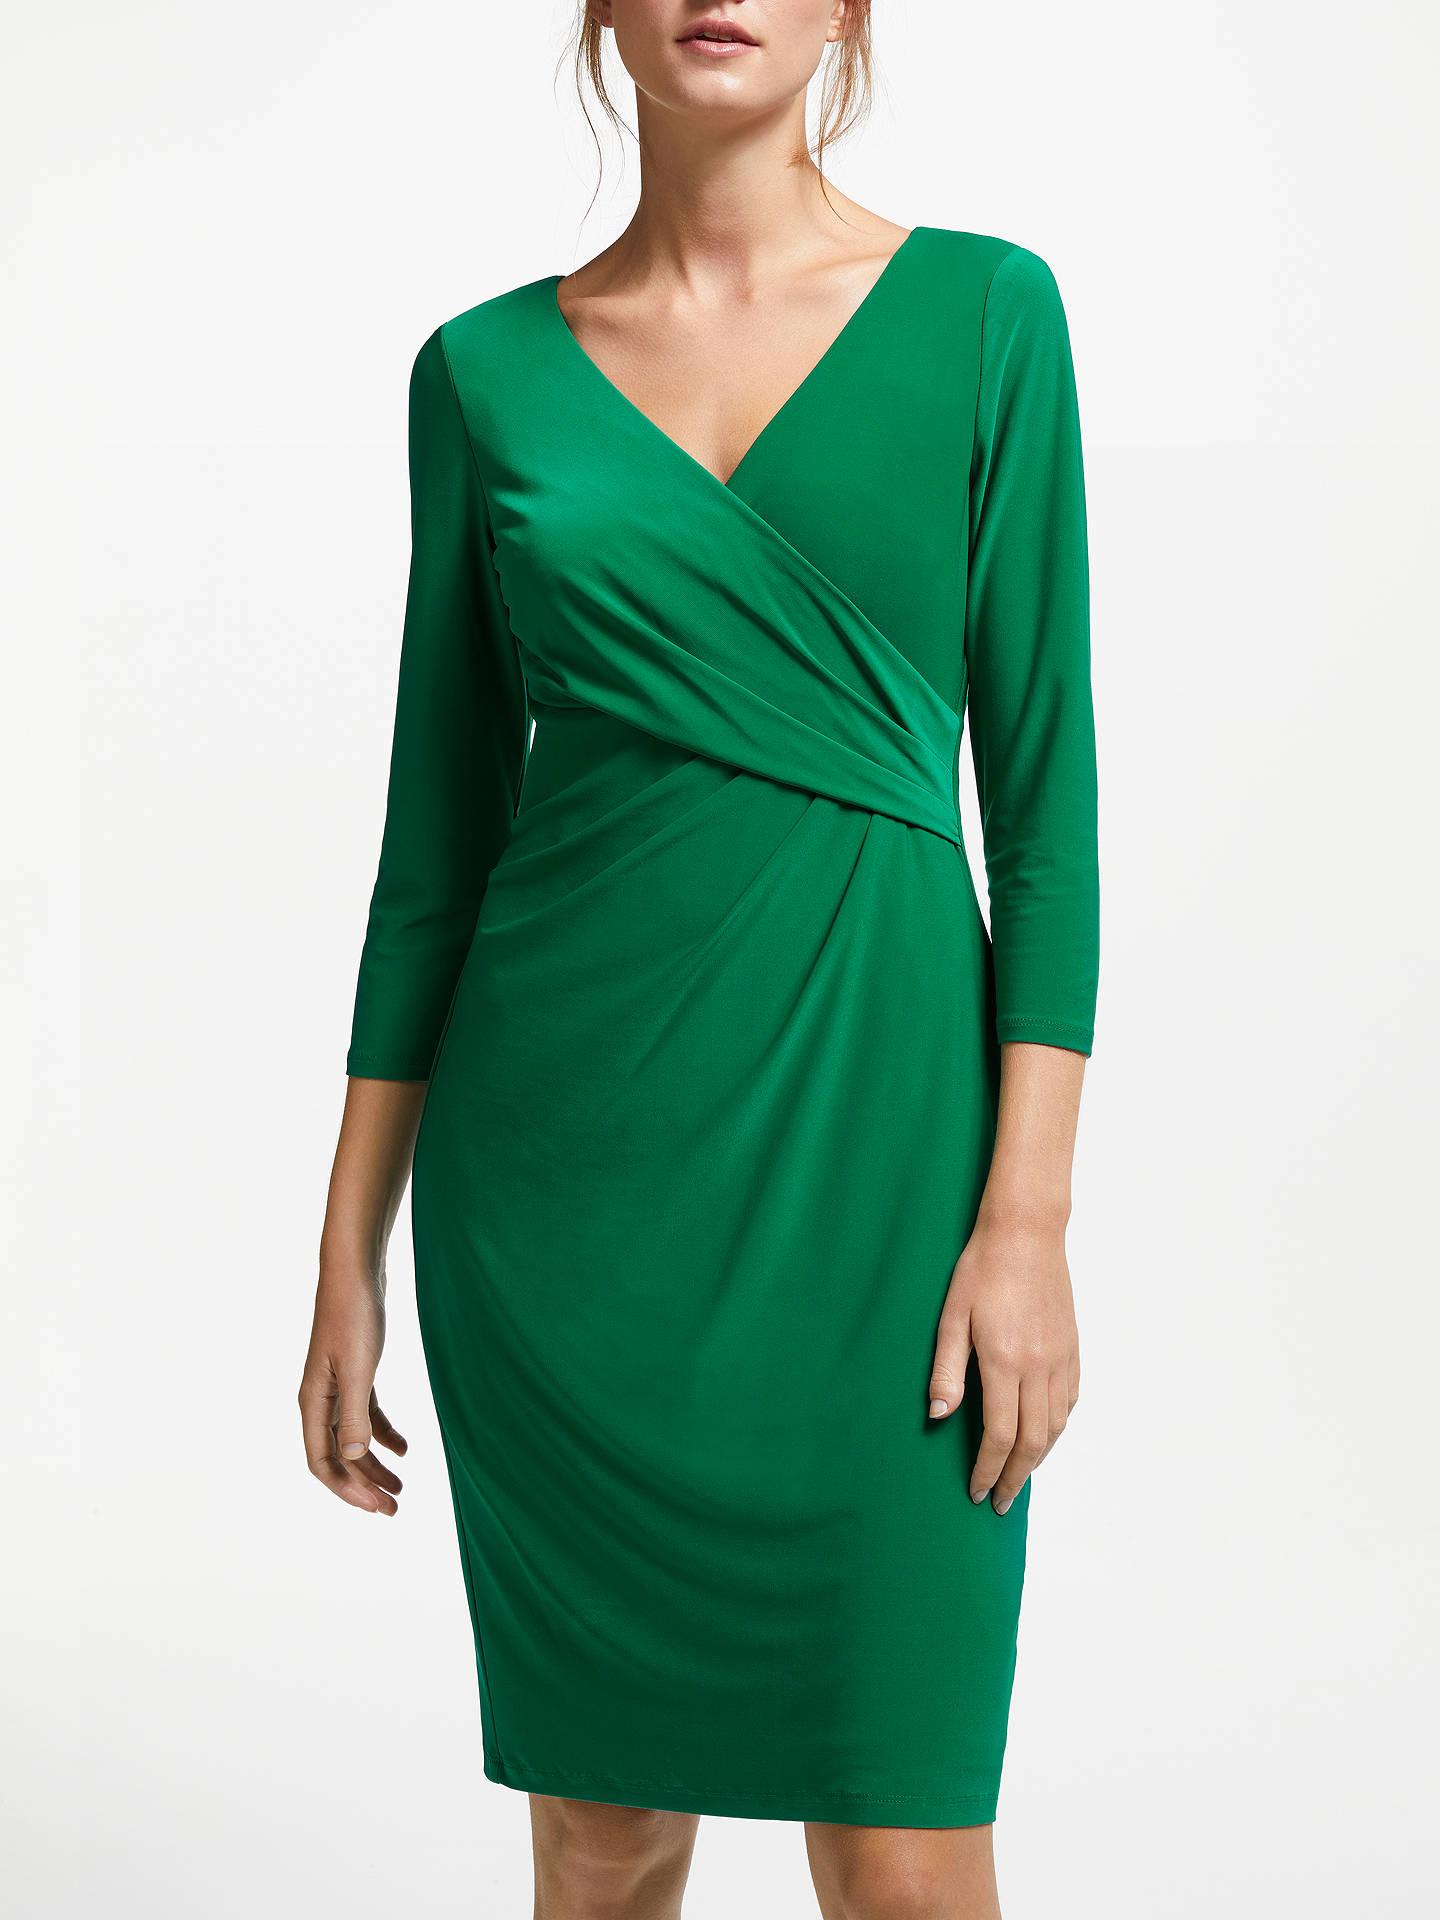 77e9c4a8ac4c3 Buy Lauren Ralph Lauren Cleora Sleeveless Ruched Dress